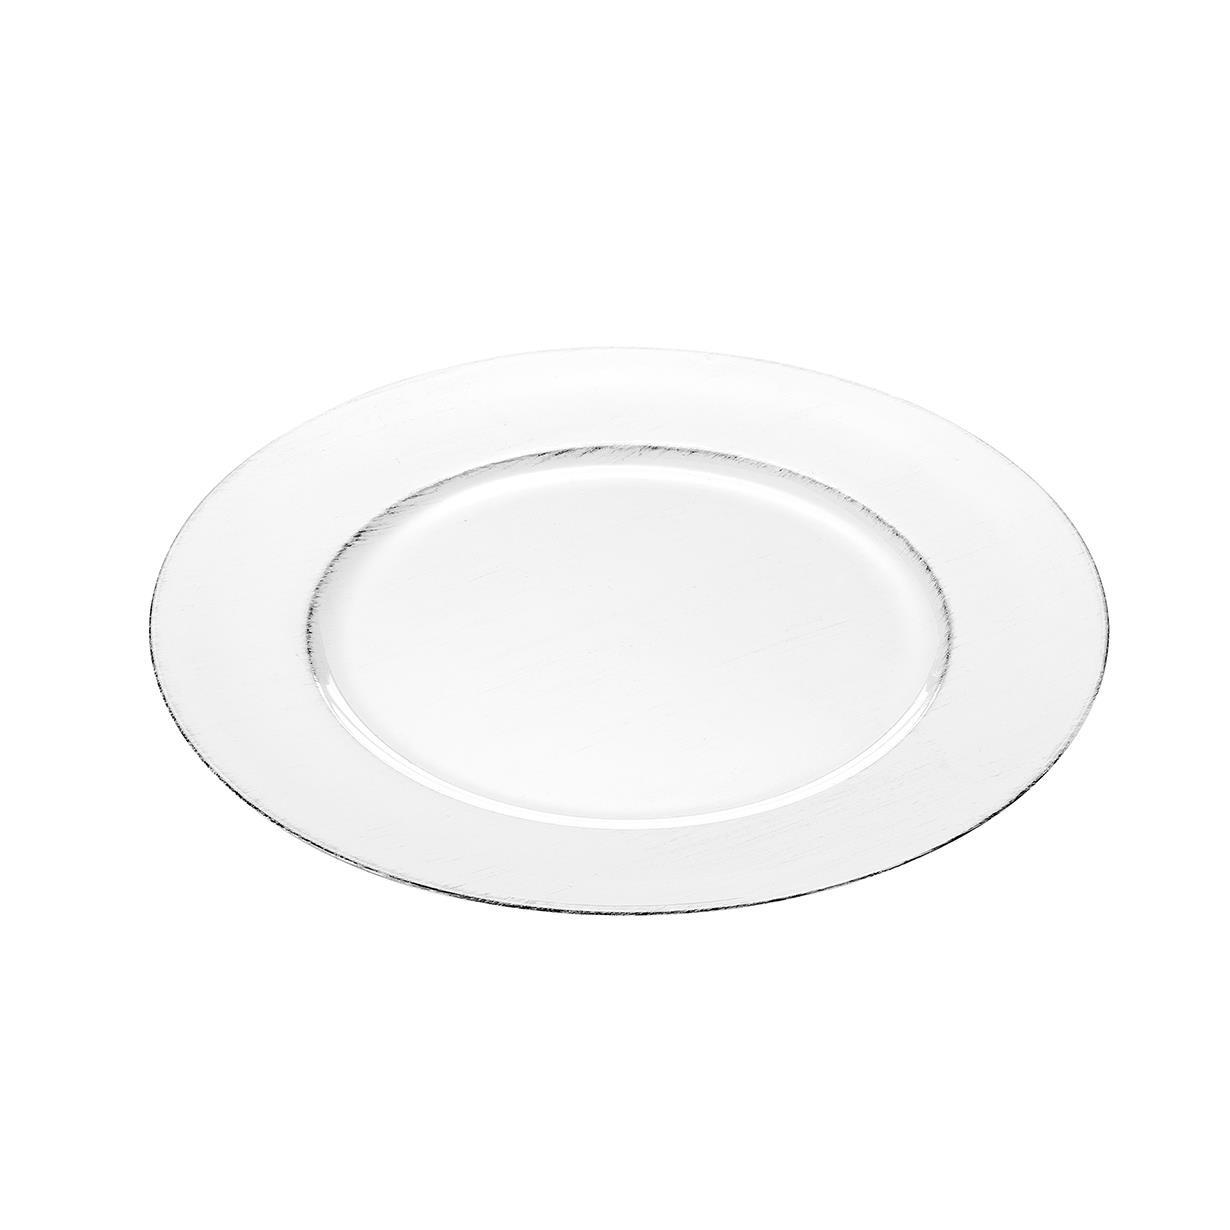 Sousplat Redondo Plastico 25cm Branco - Lyor